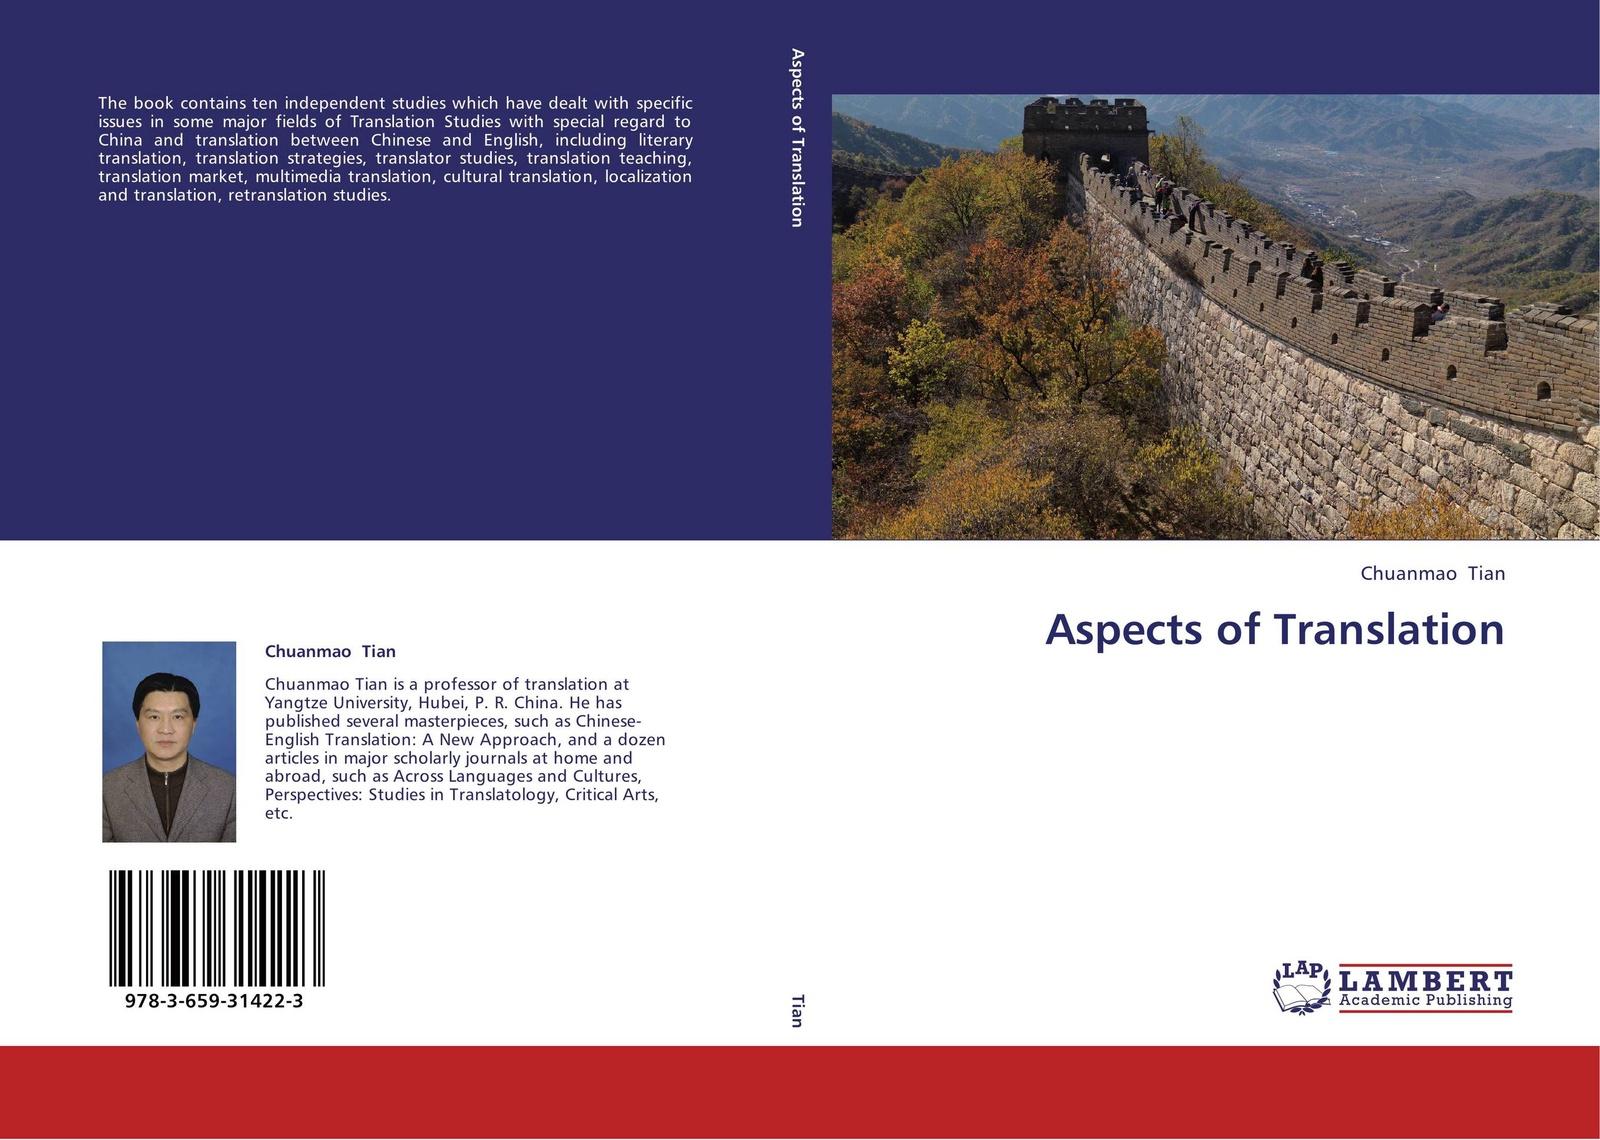 Chuanmao Tian Aspects of Translation